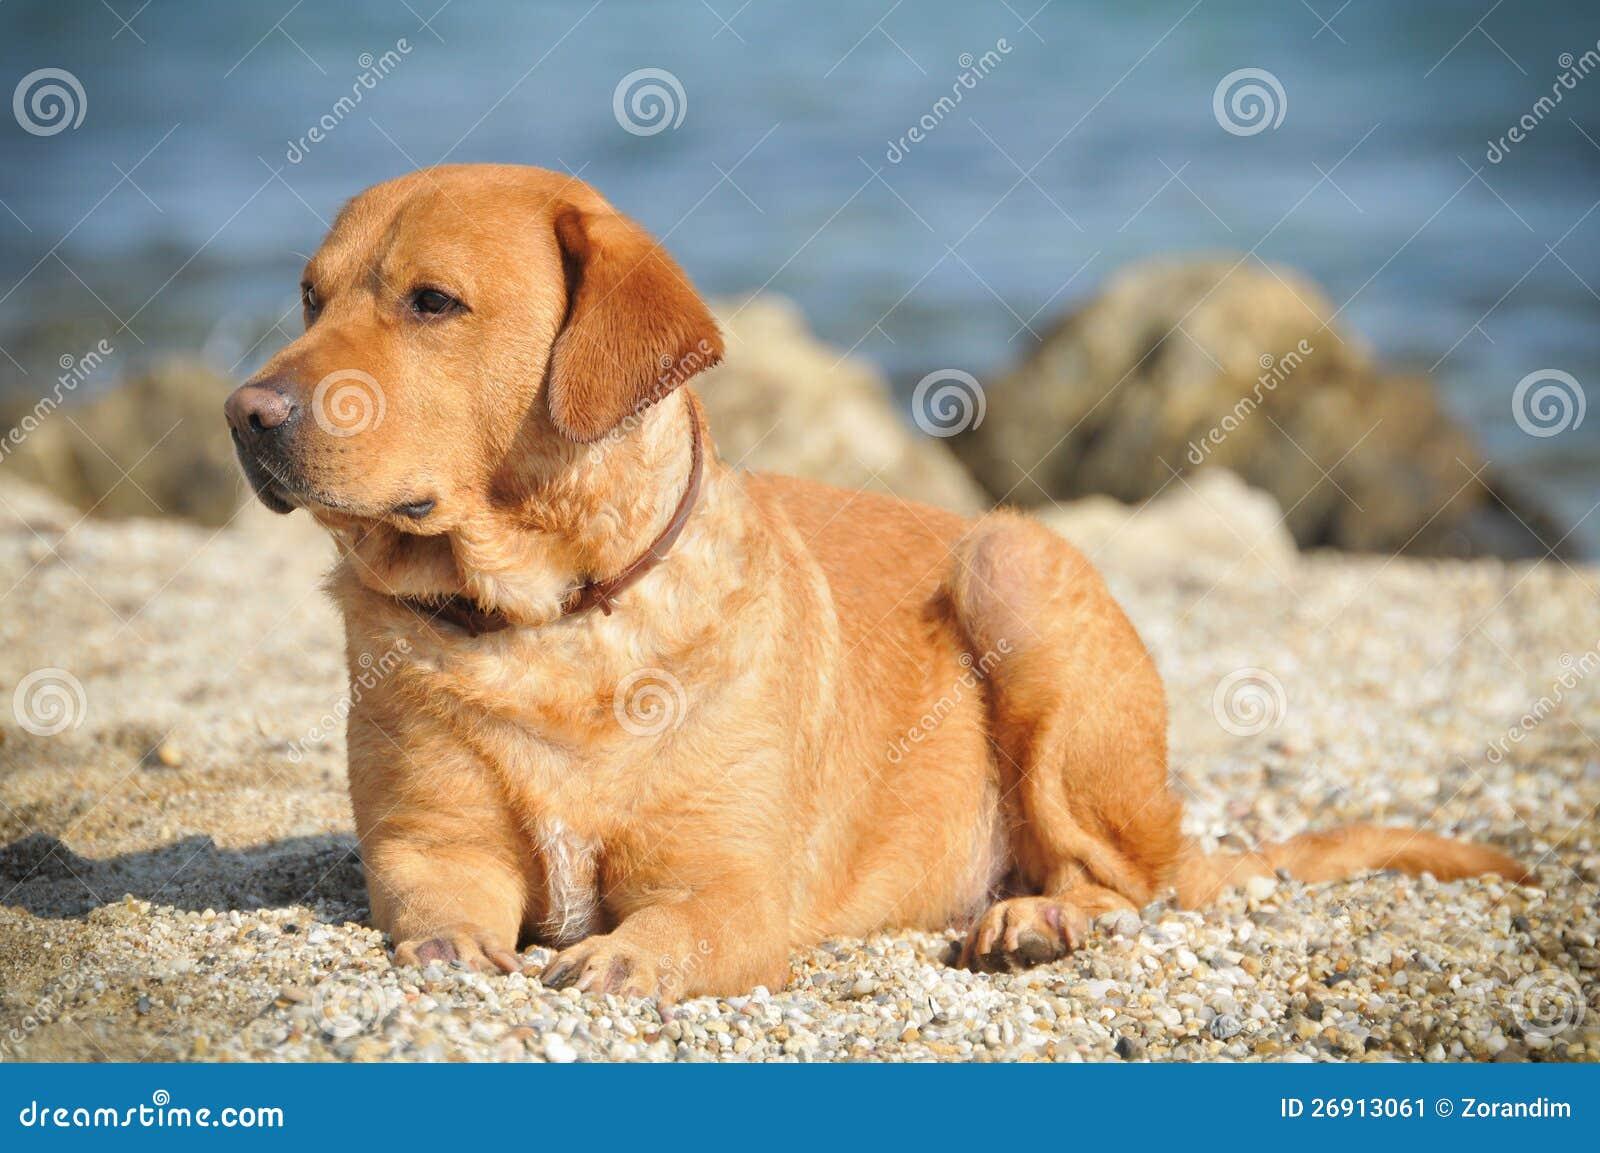 Golden Labrador Stock Image - Image: 26913061